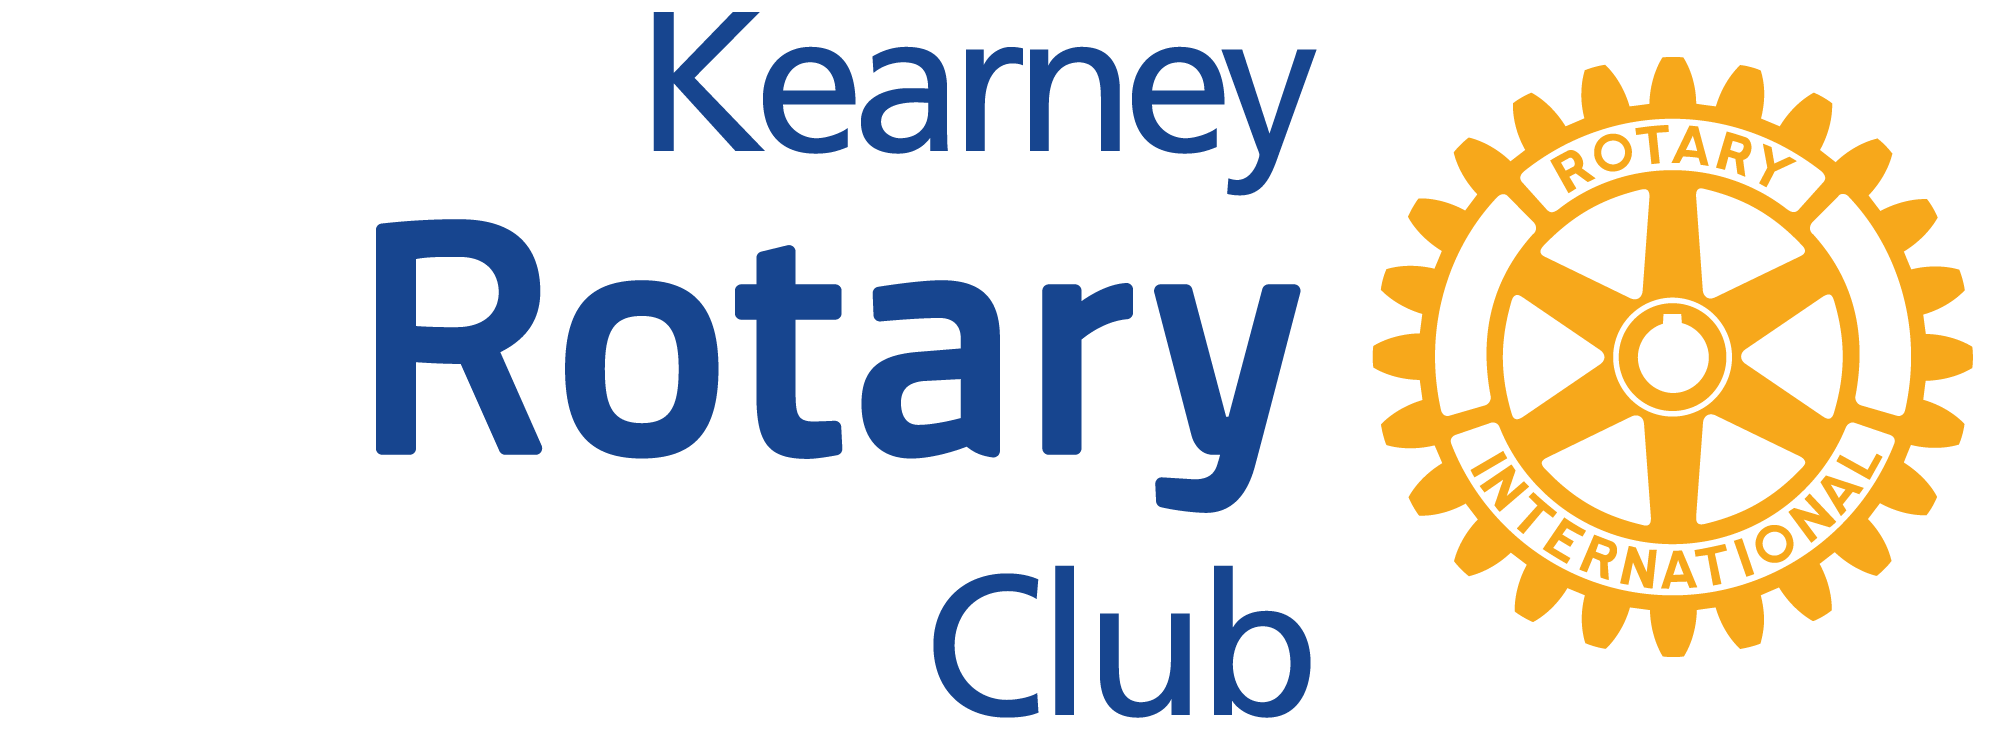 Kearney Rotary Club